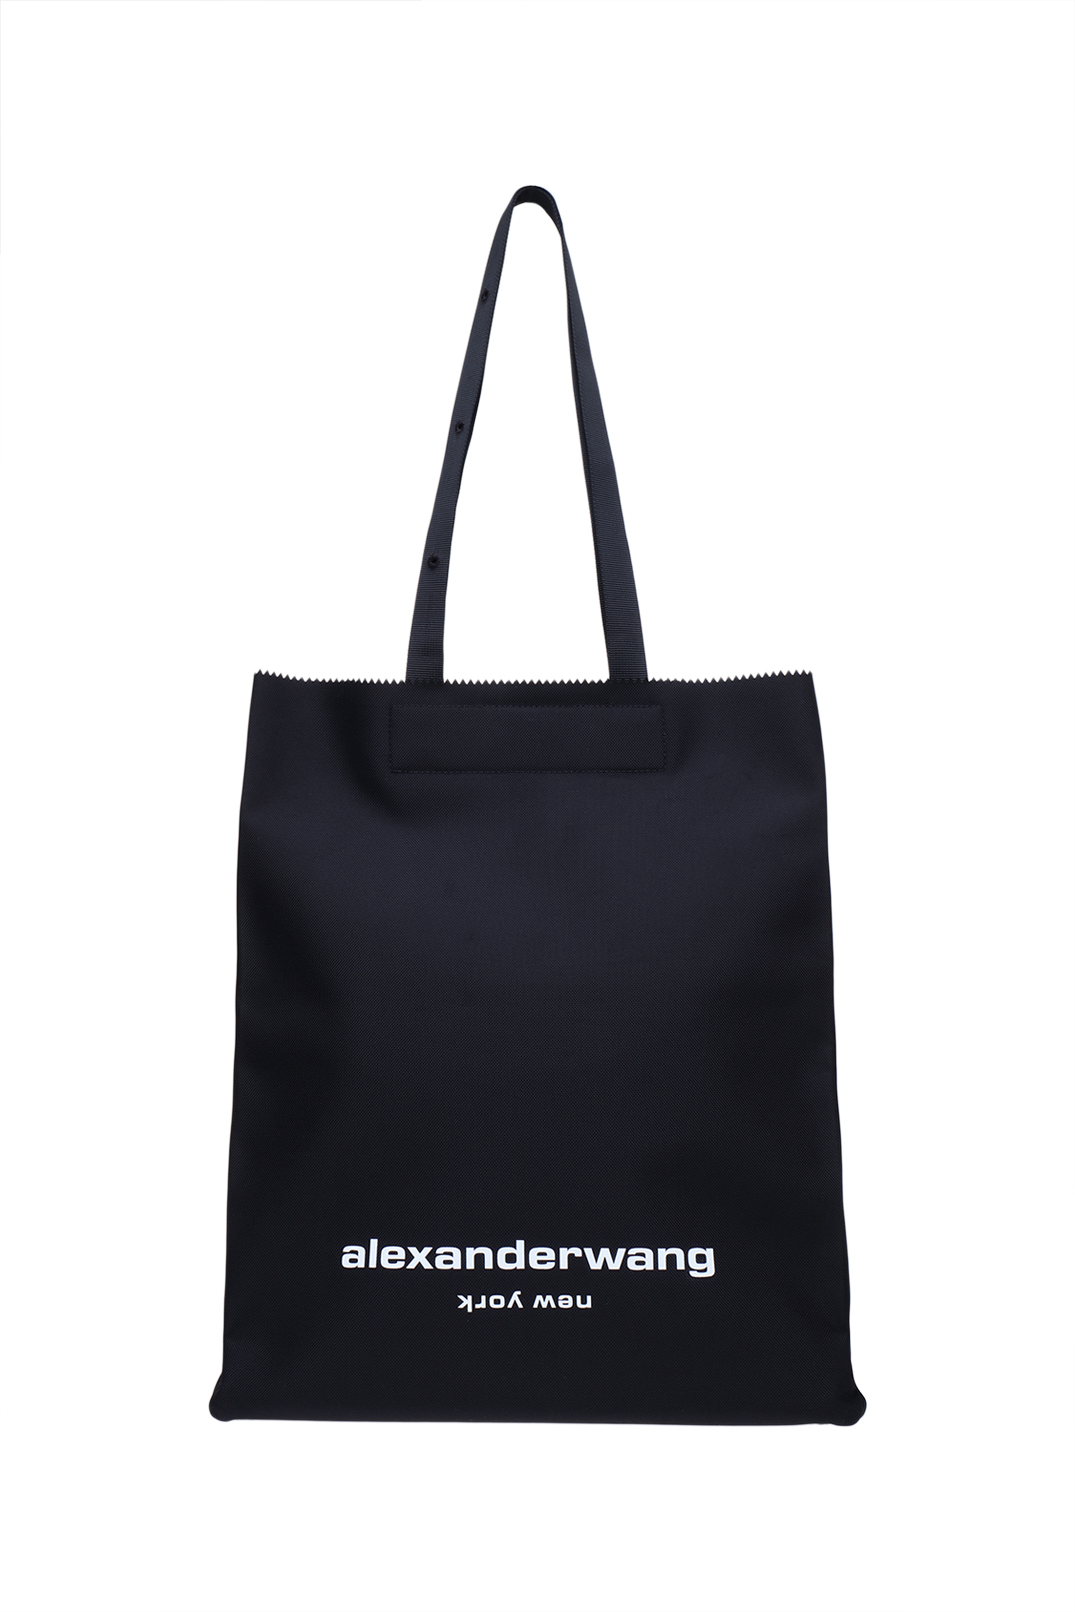 Сумка-тоут с логотипом ALEXANDER WANG AWbp11002